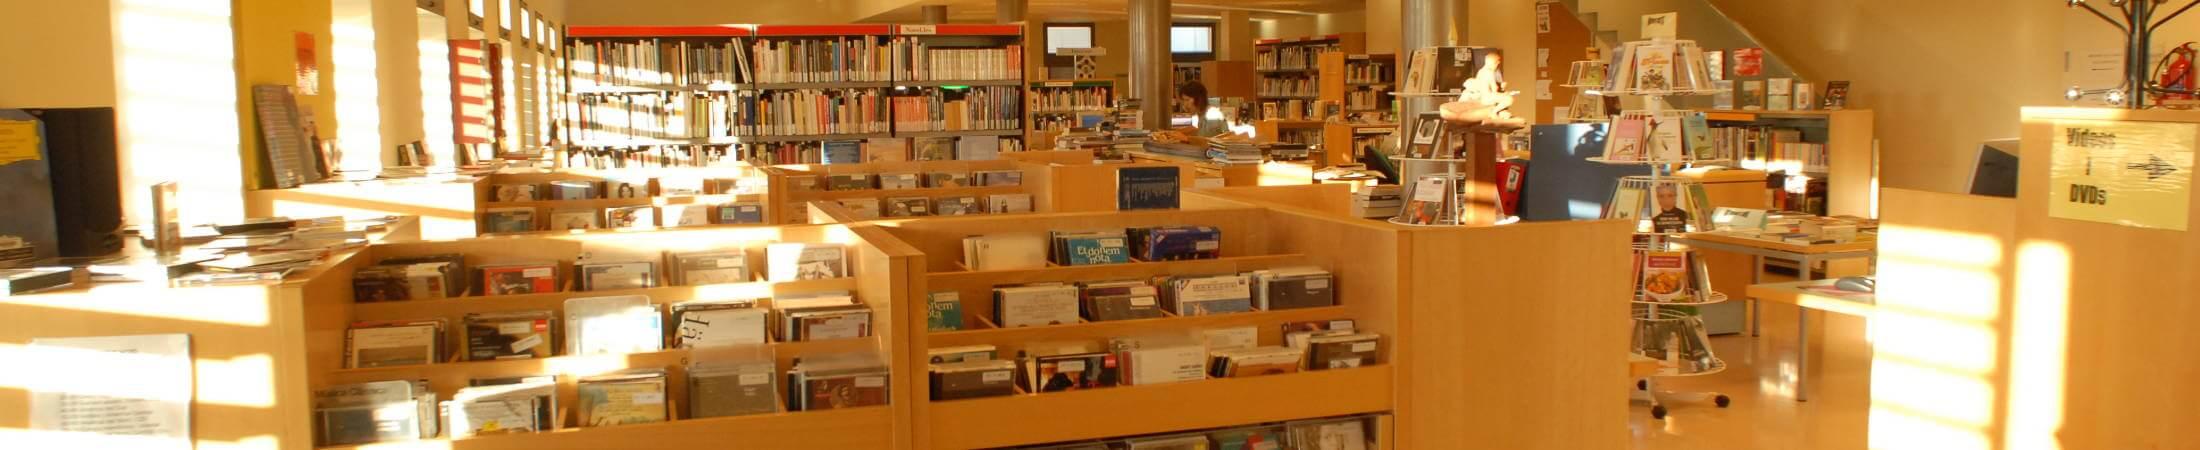 biblioteca capcalera-2200x450